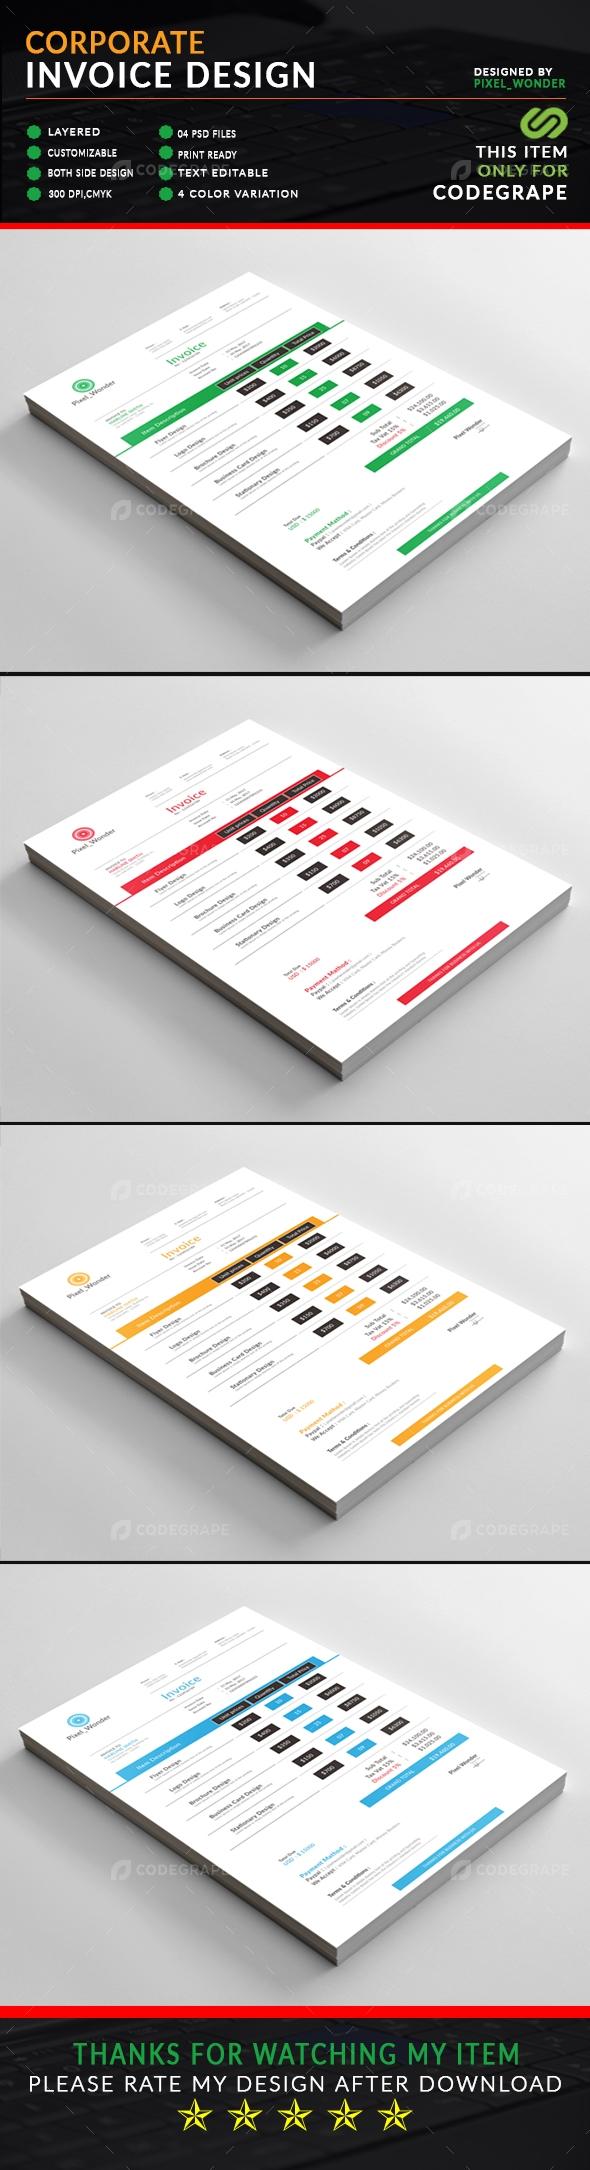 Corporate Invoice Design Print Codegrape